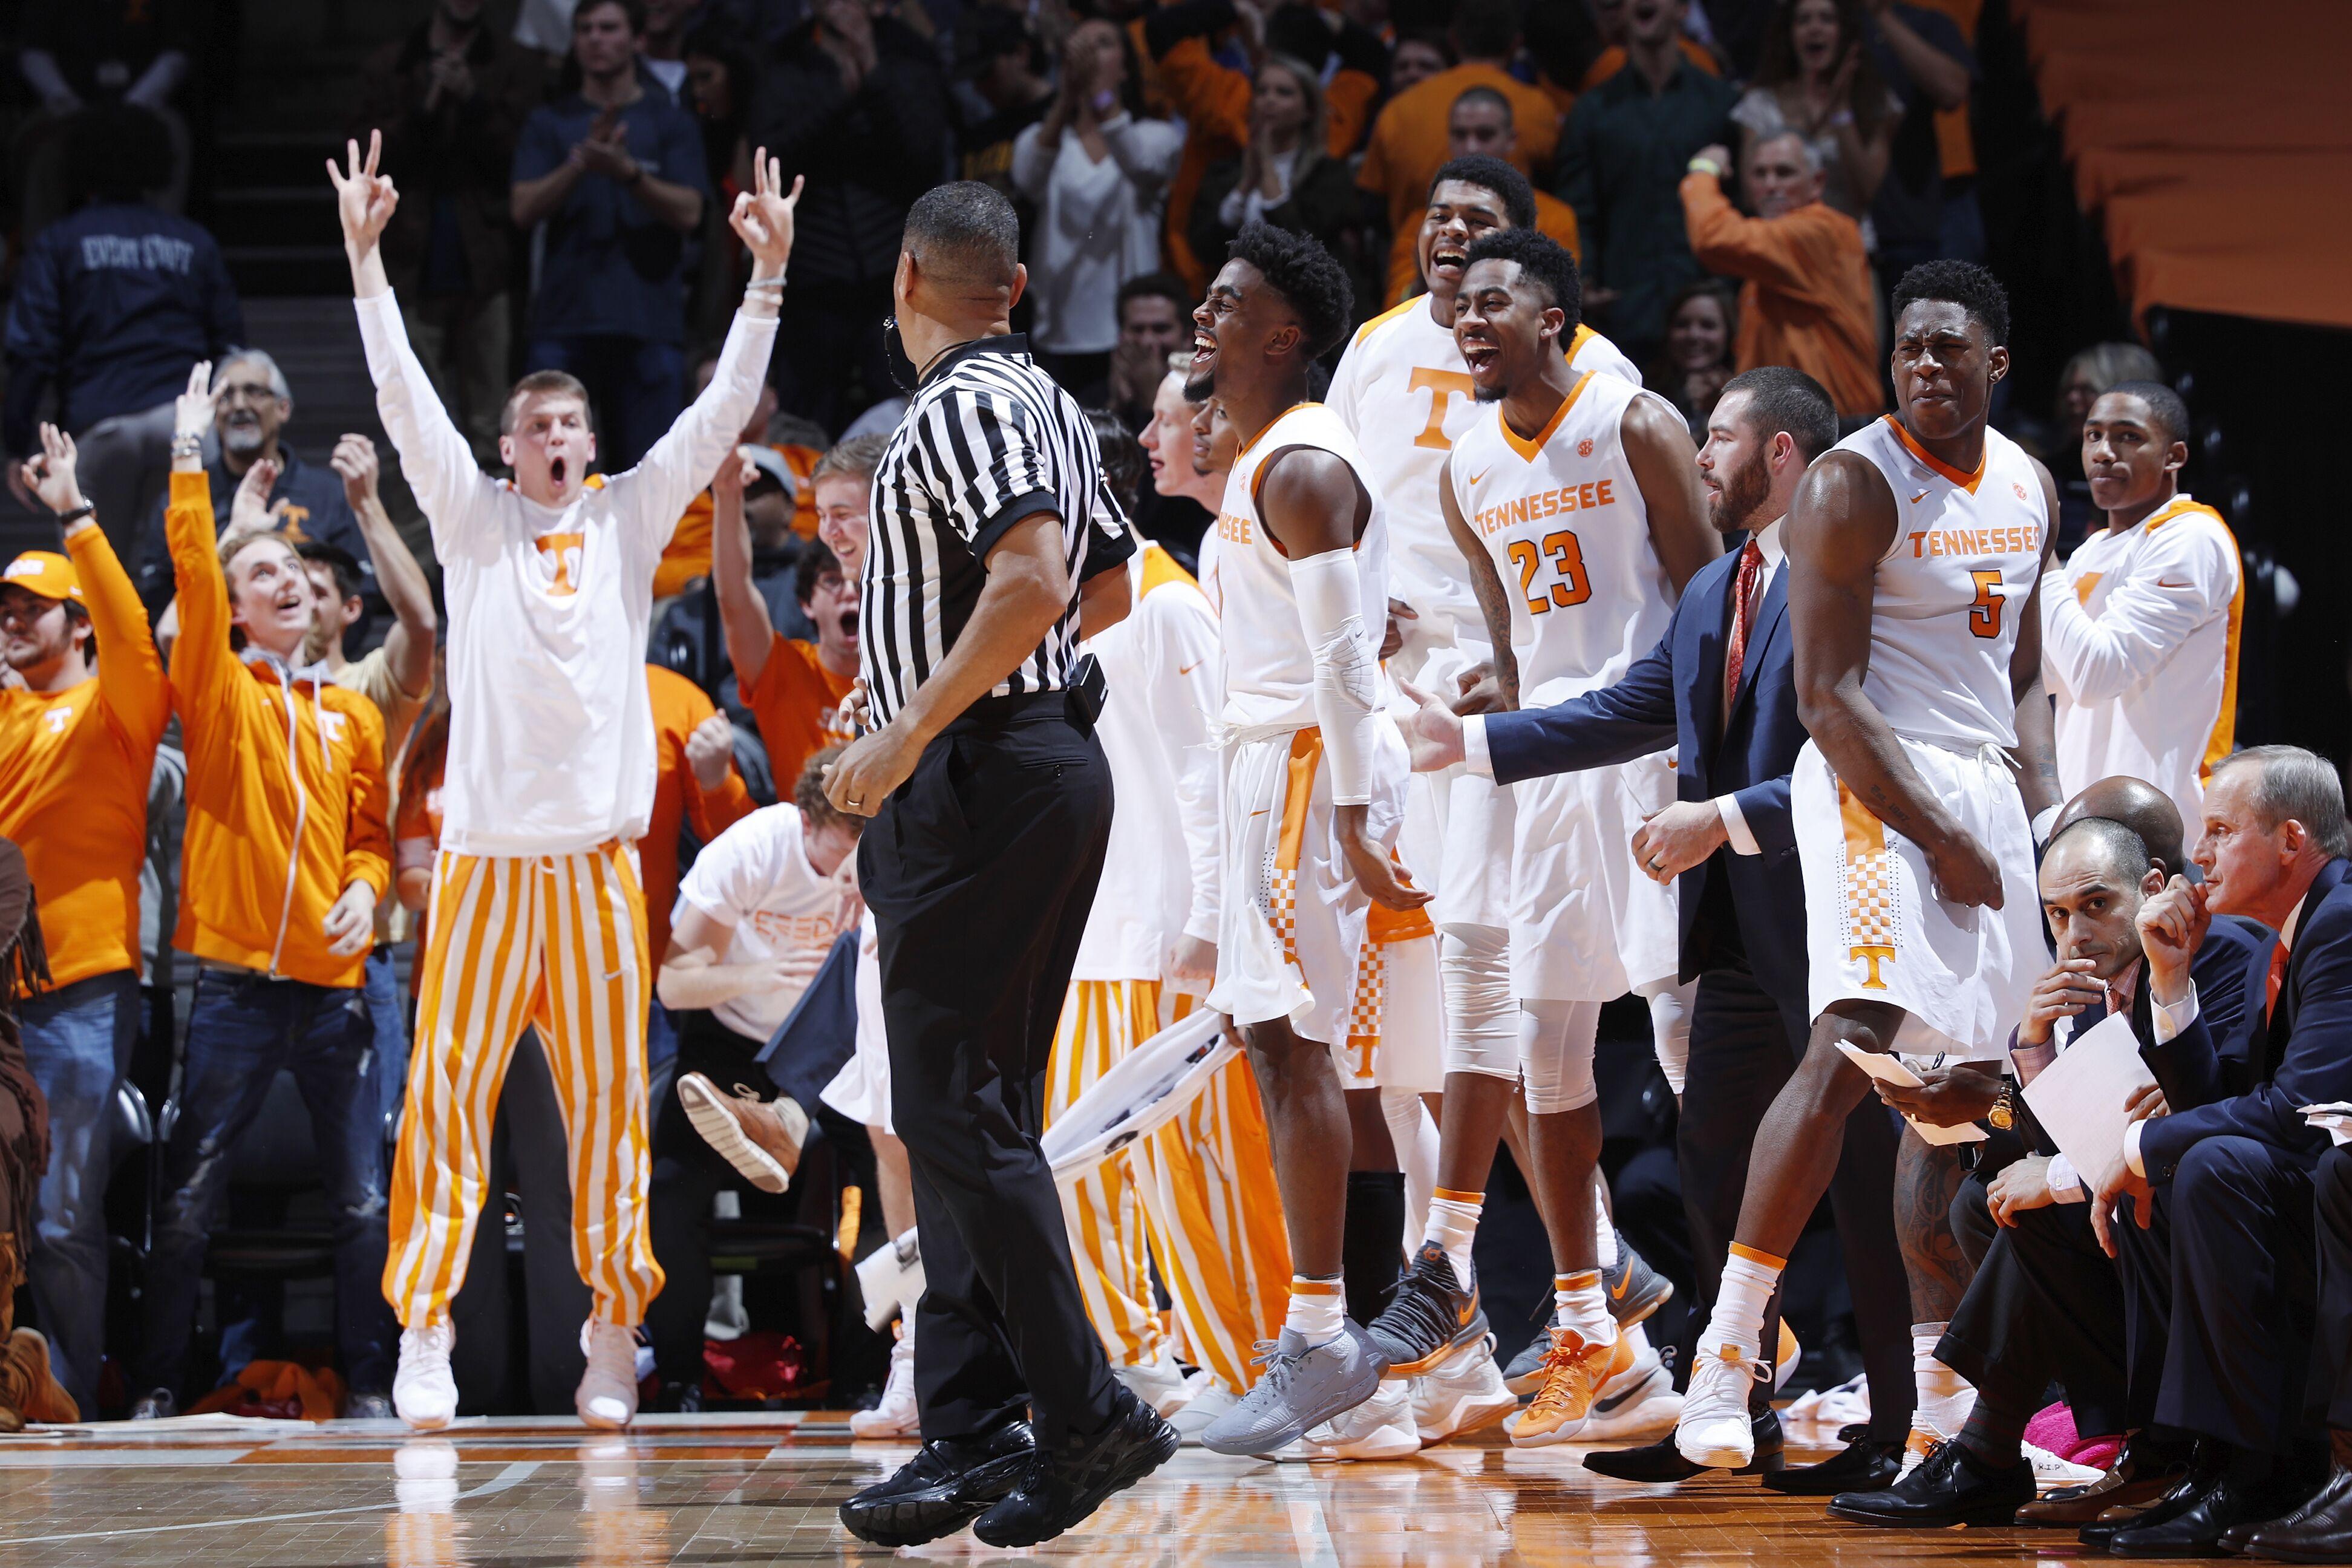 Uk Basketball: Tennessee Basketball: Vols Pick Up Huge Win At Rupp Arena